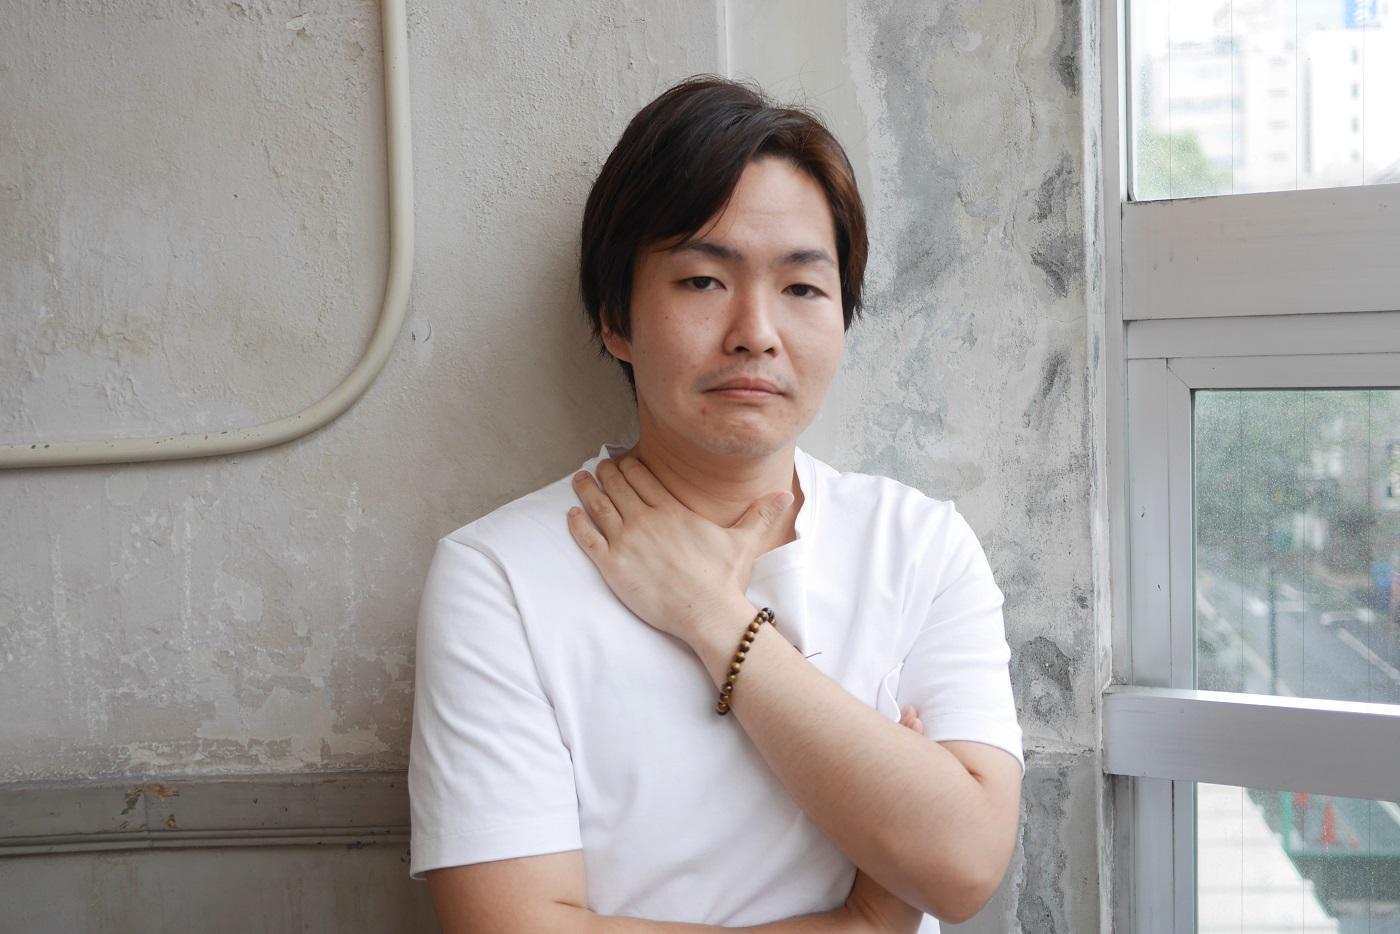 http://news.yoshimoto.co.jp/20160929163627-284c4c764a7bf7a4dd3381772940723597df0aaf.jpg